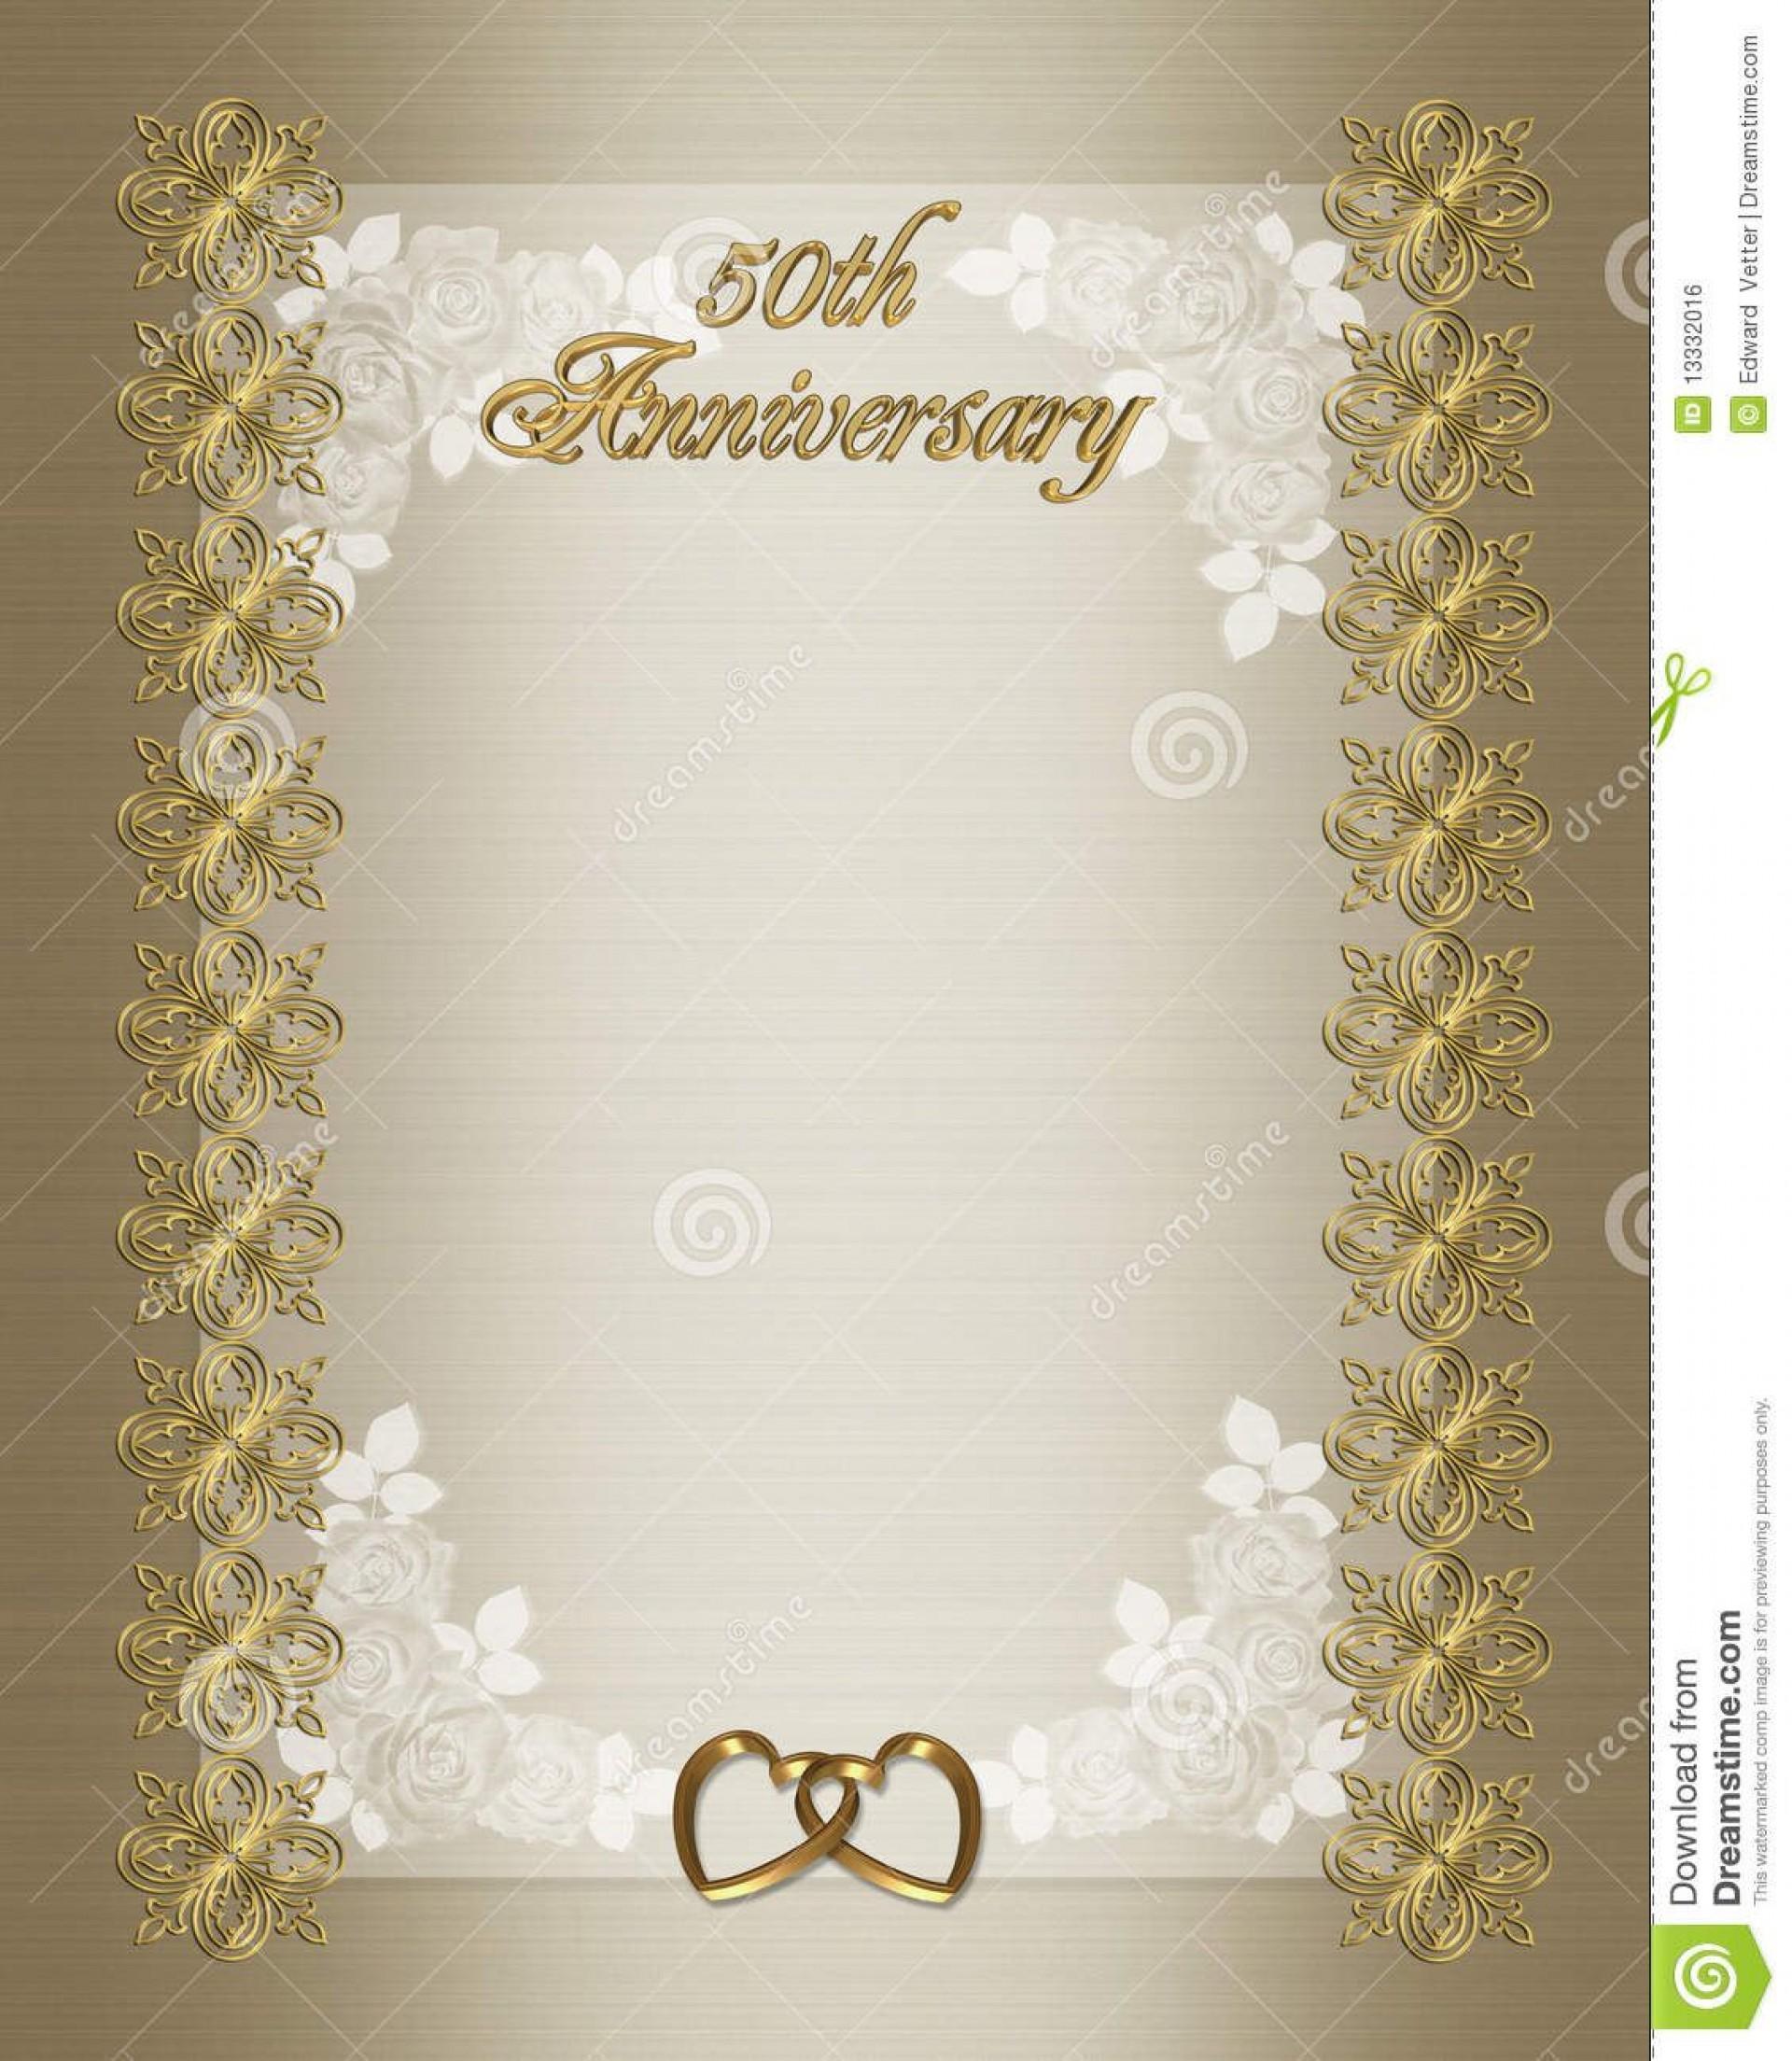 006 Wondrou Free Printable 50th Wedding Anniversary Invitation Template Design 1920